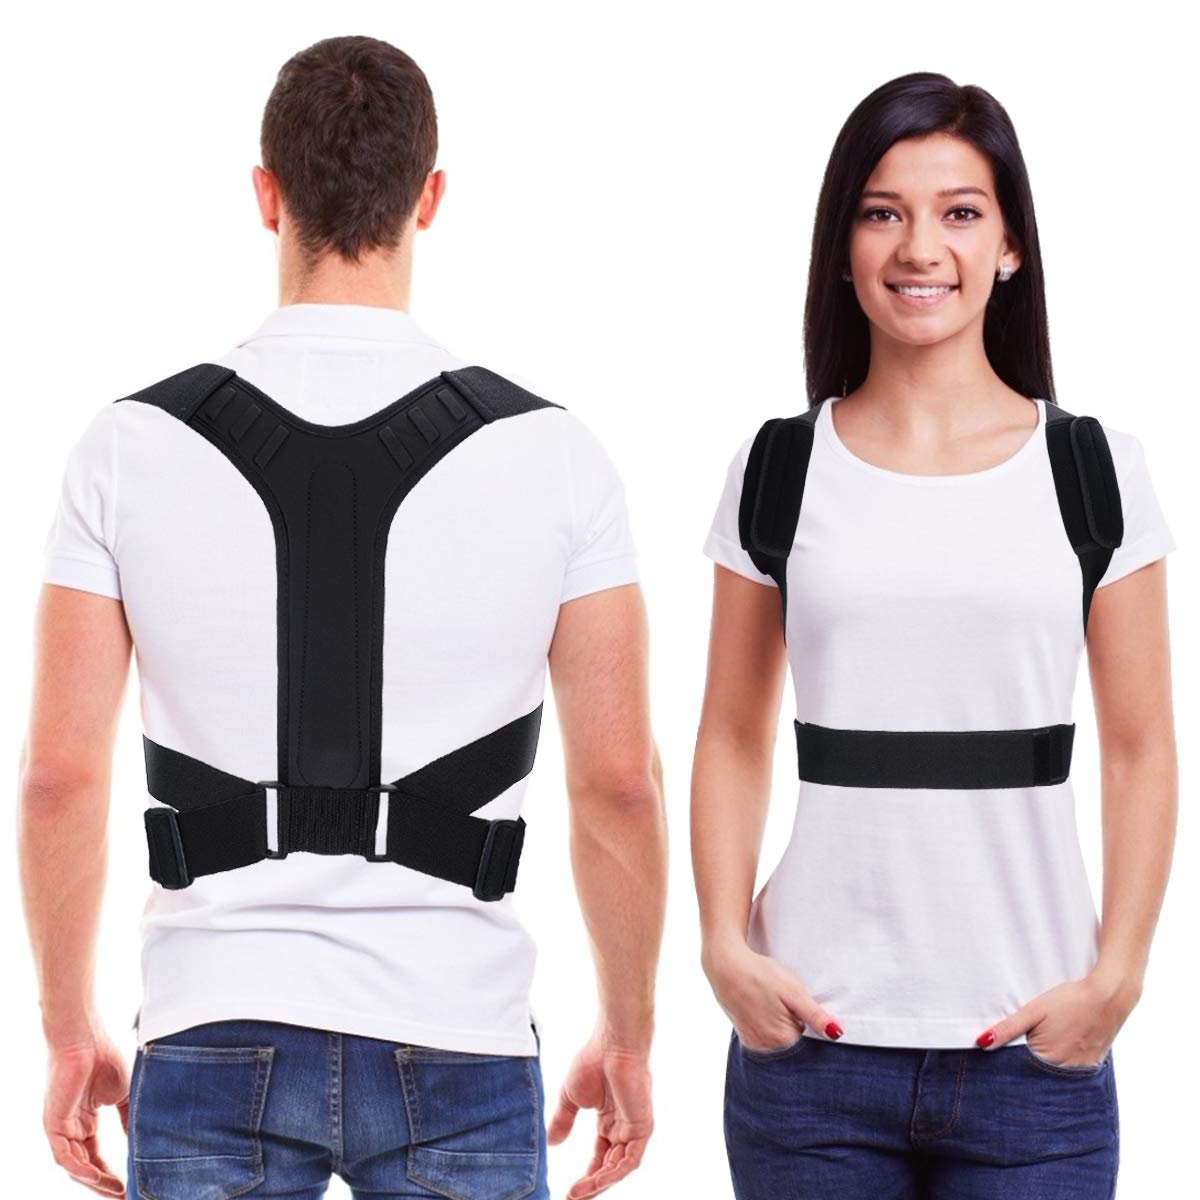 Back Brace Posture Corrector for Men and Women -Xdtlty Adjustable Upper Back and Legs Brace